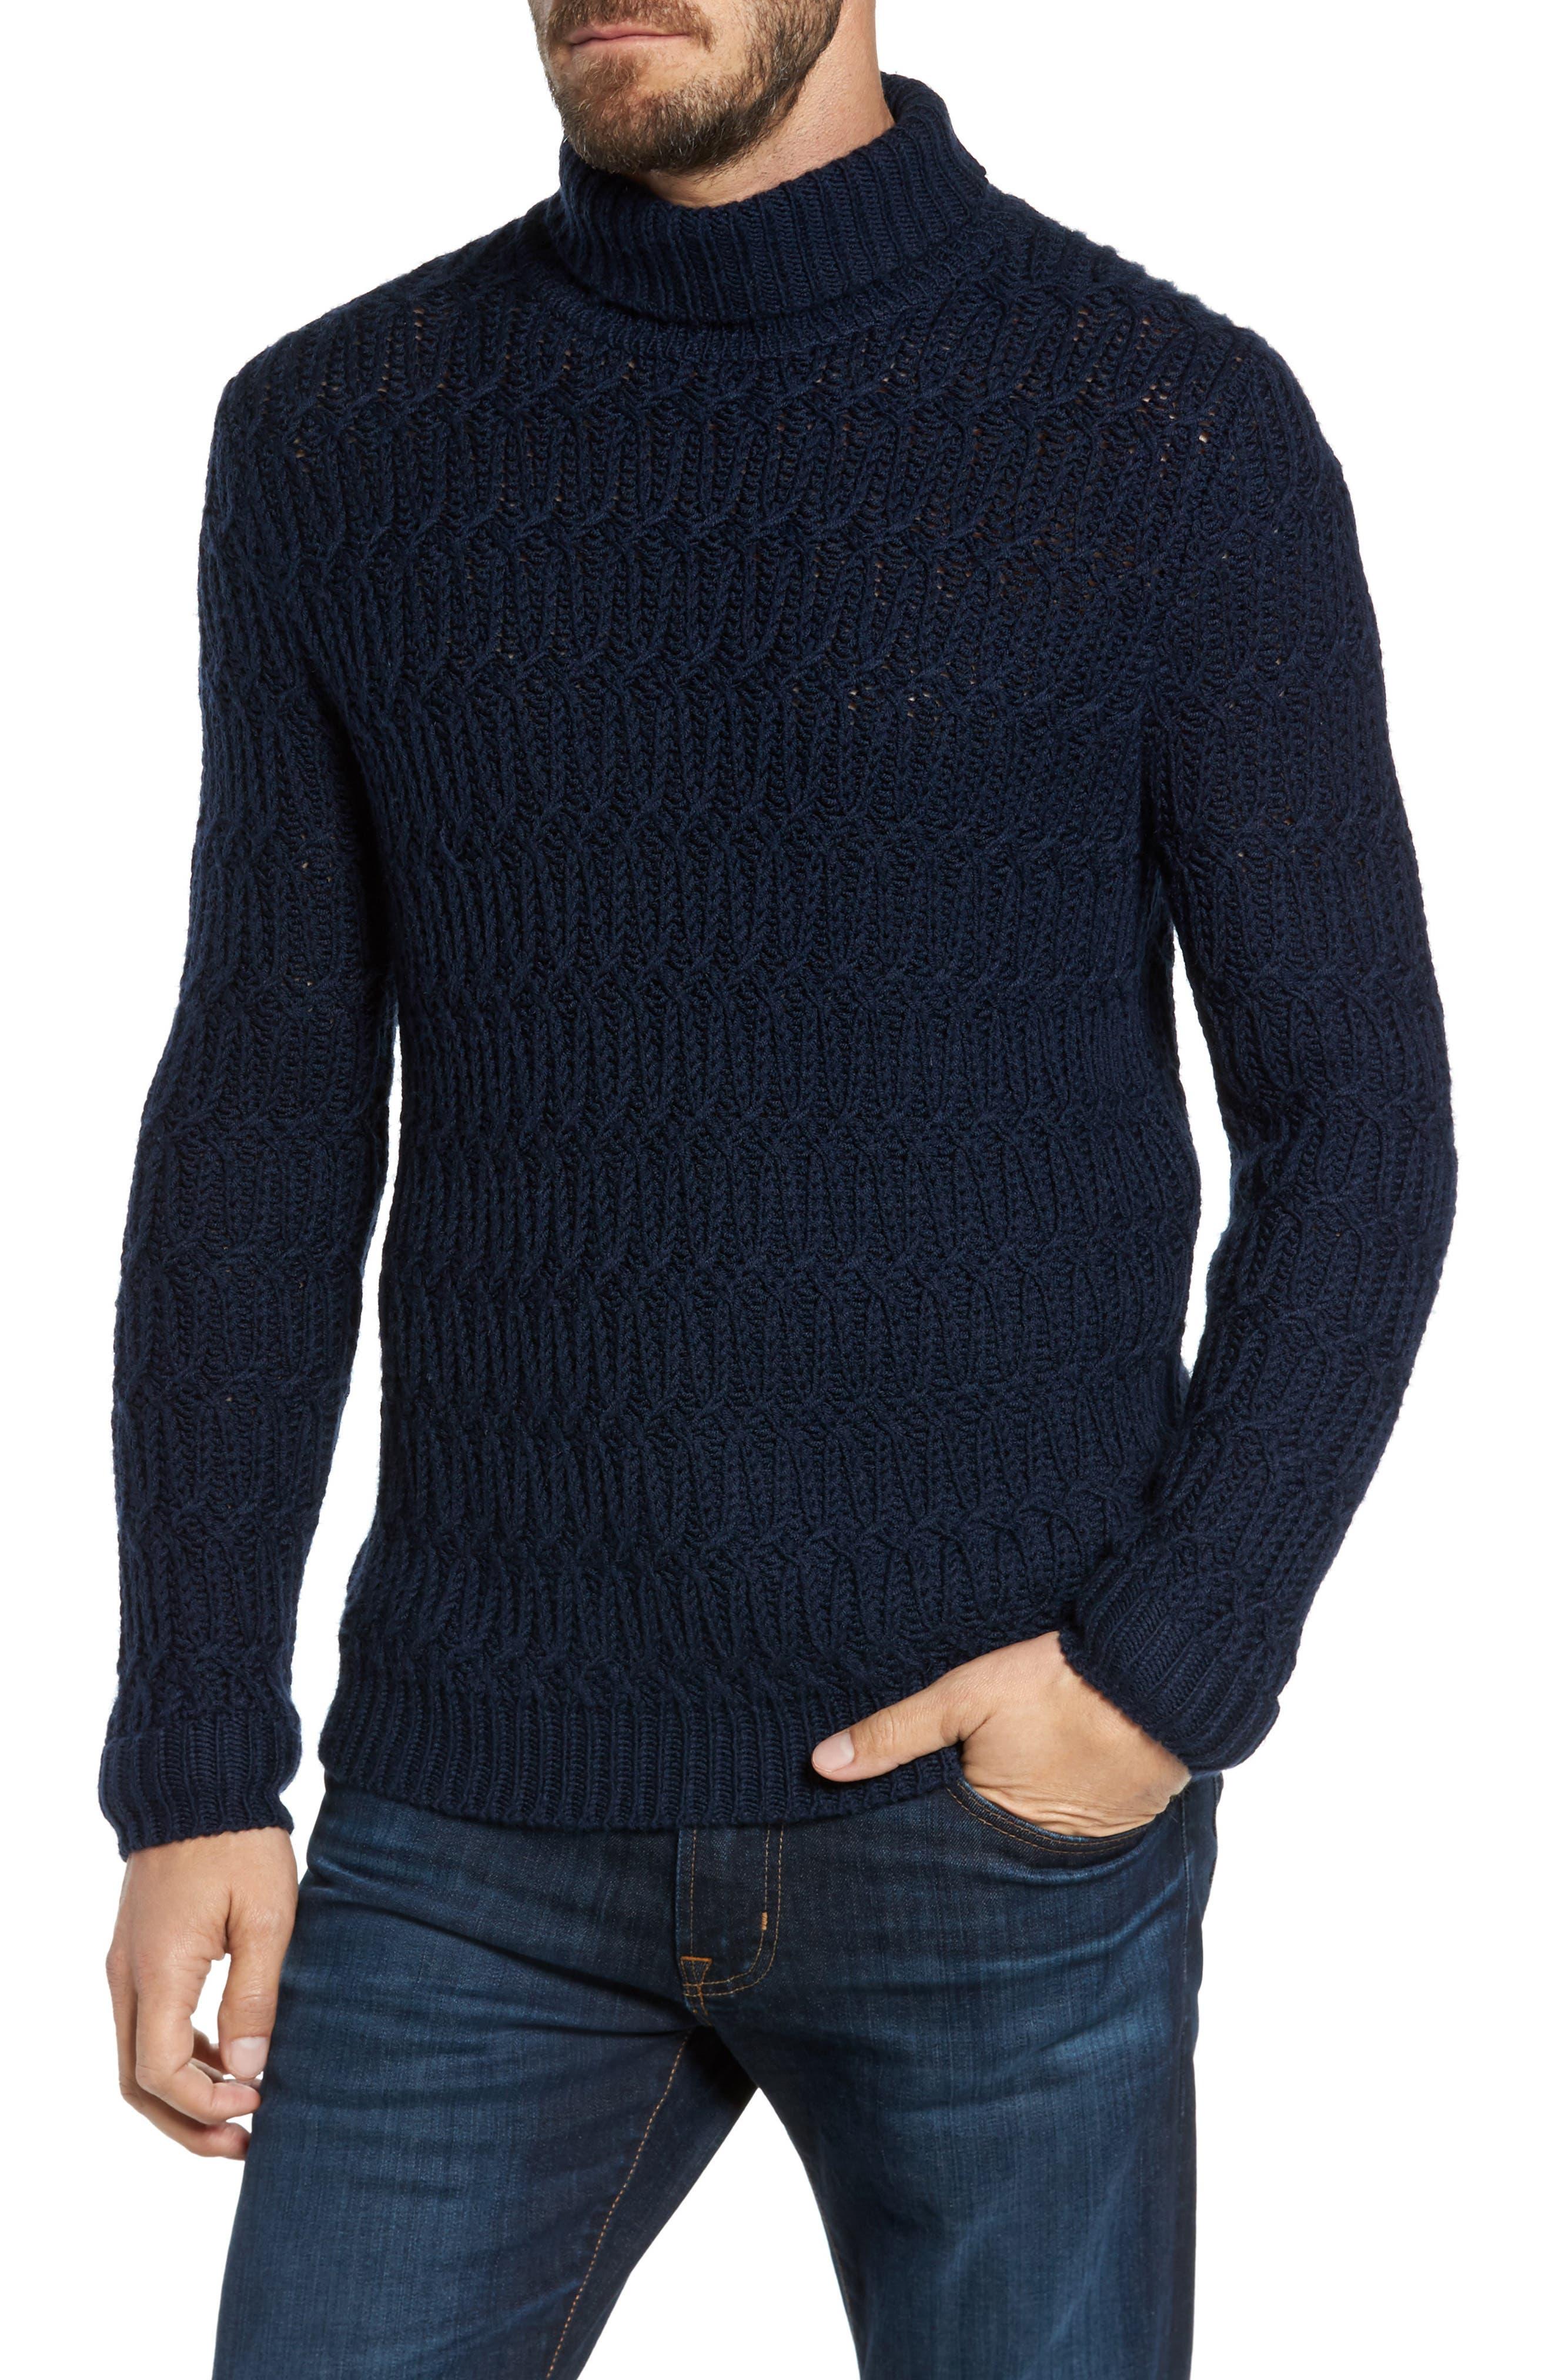 Nordstrom Men's Shop Chunky Turtleneck Sweater